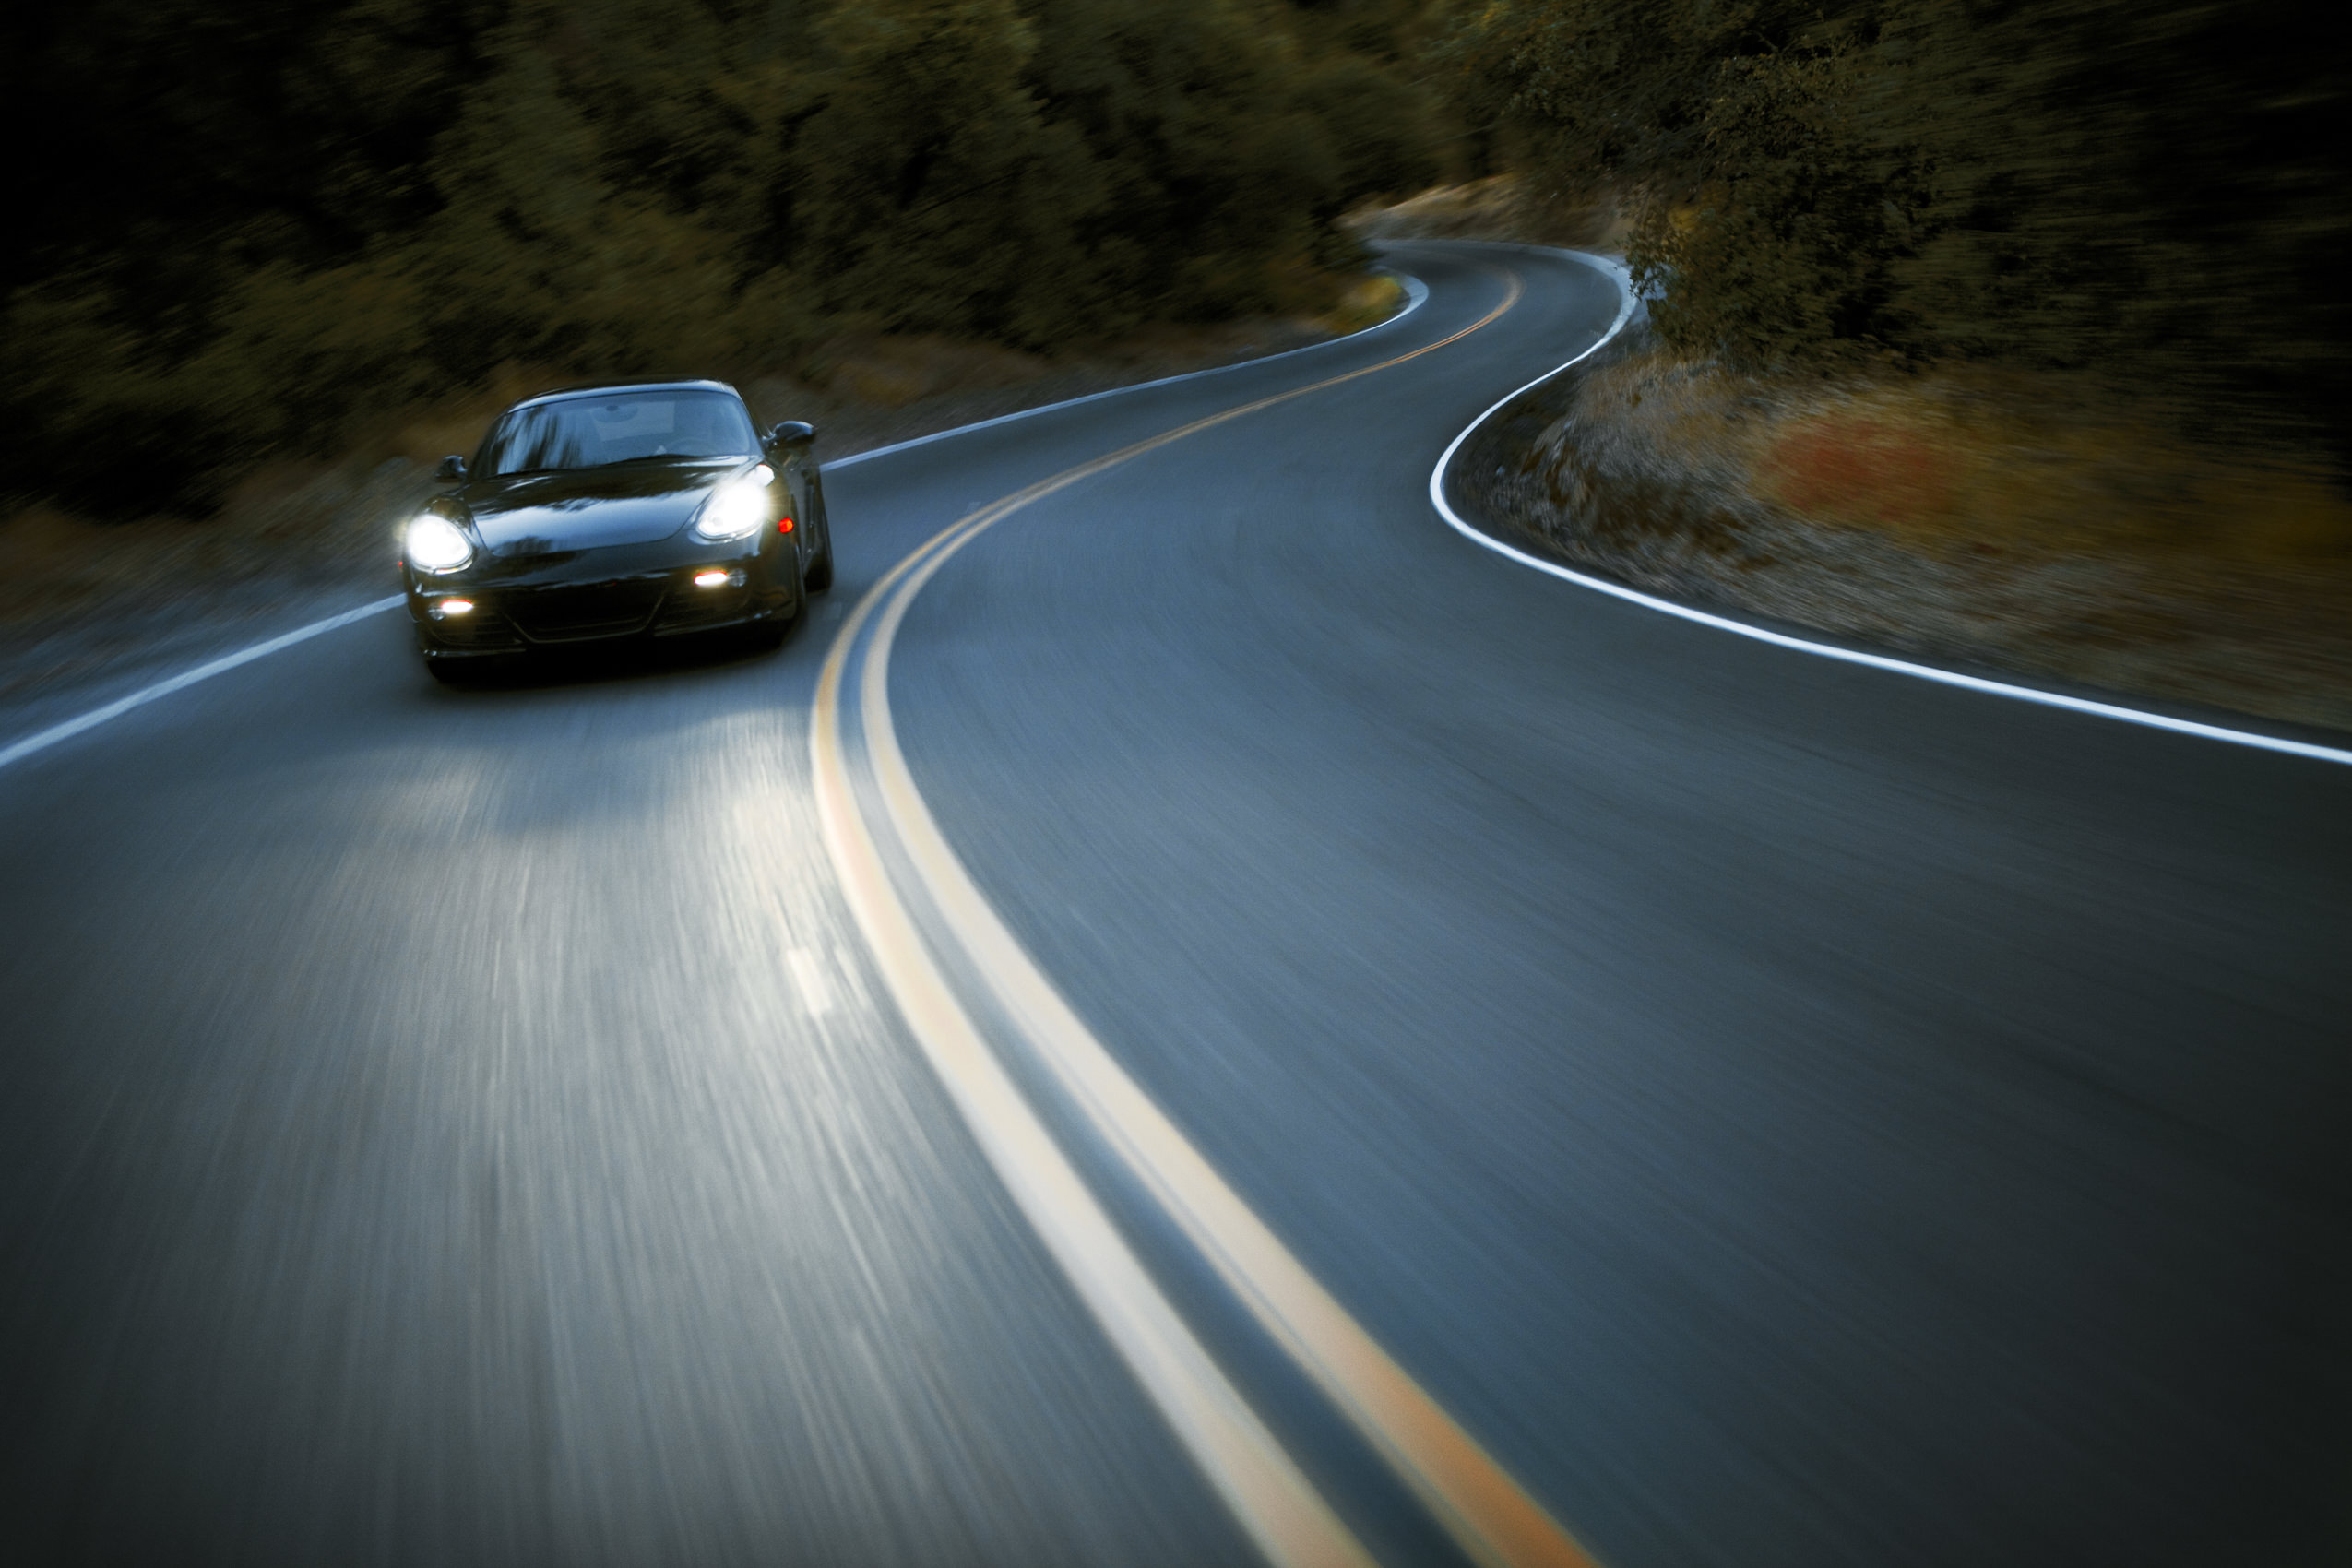 Porsche-advertising-photographer.jpg